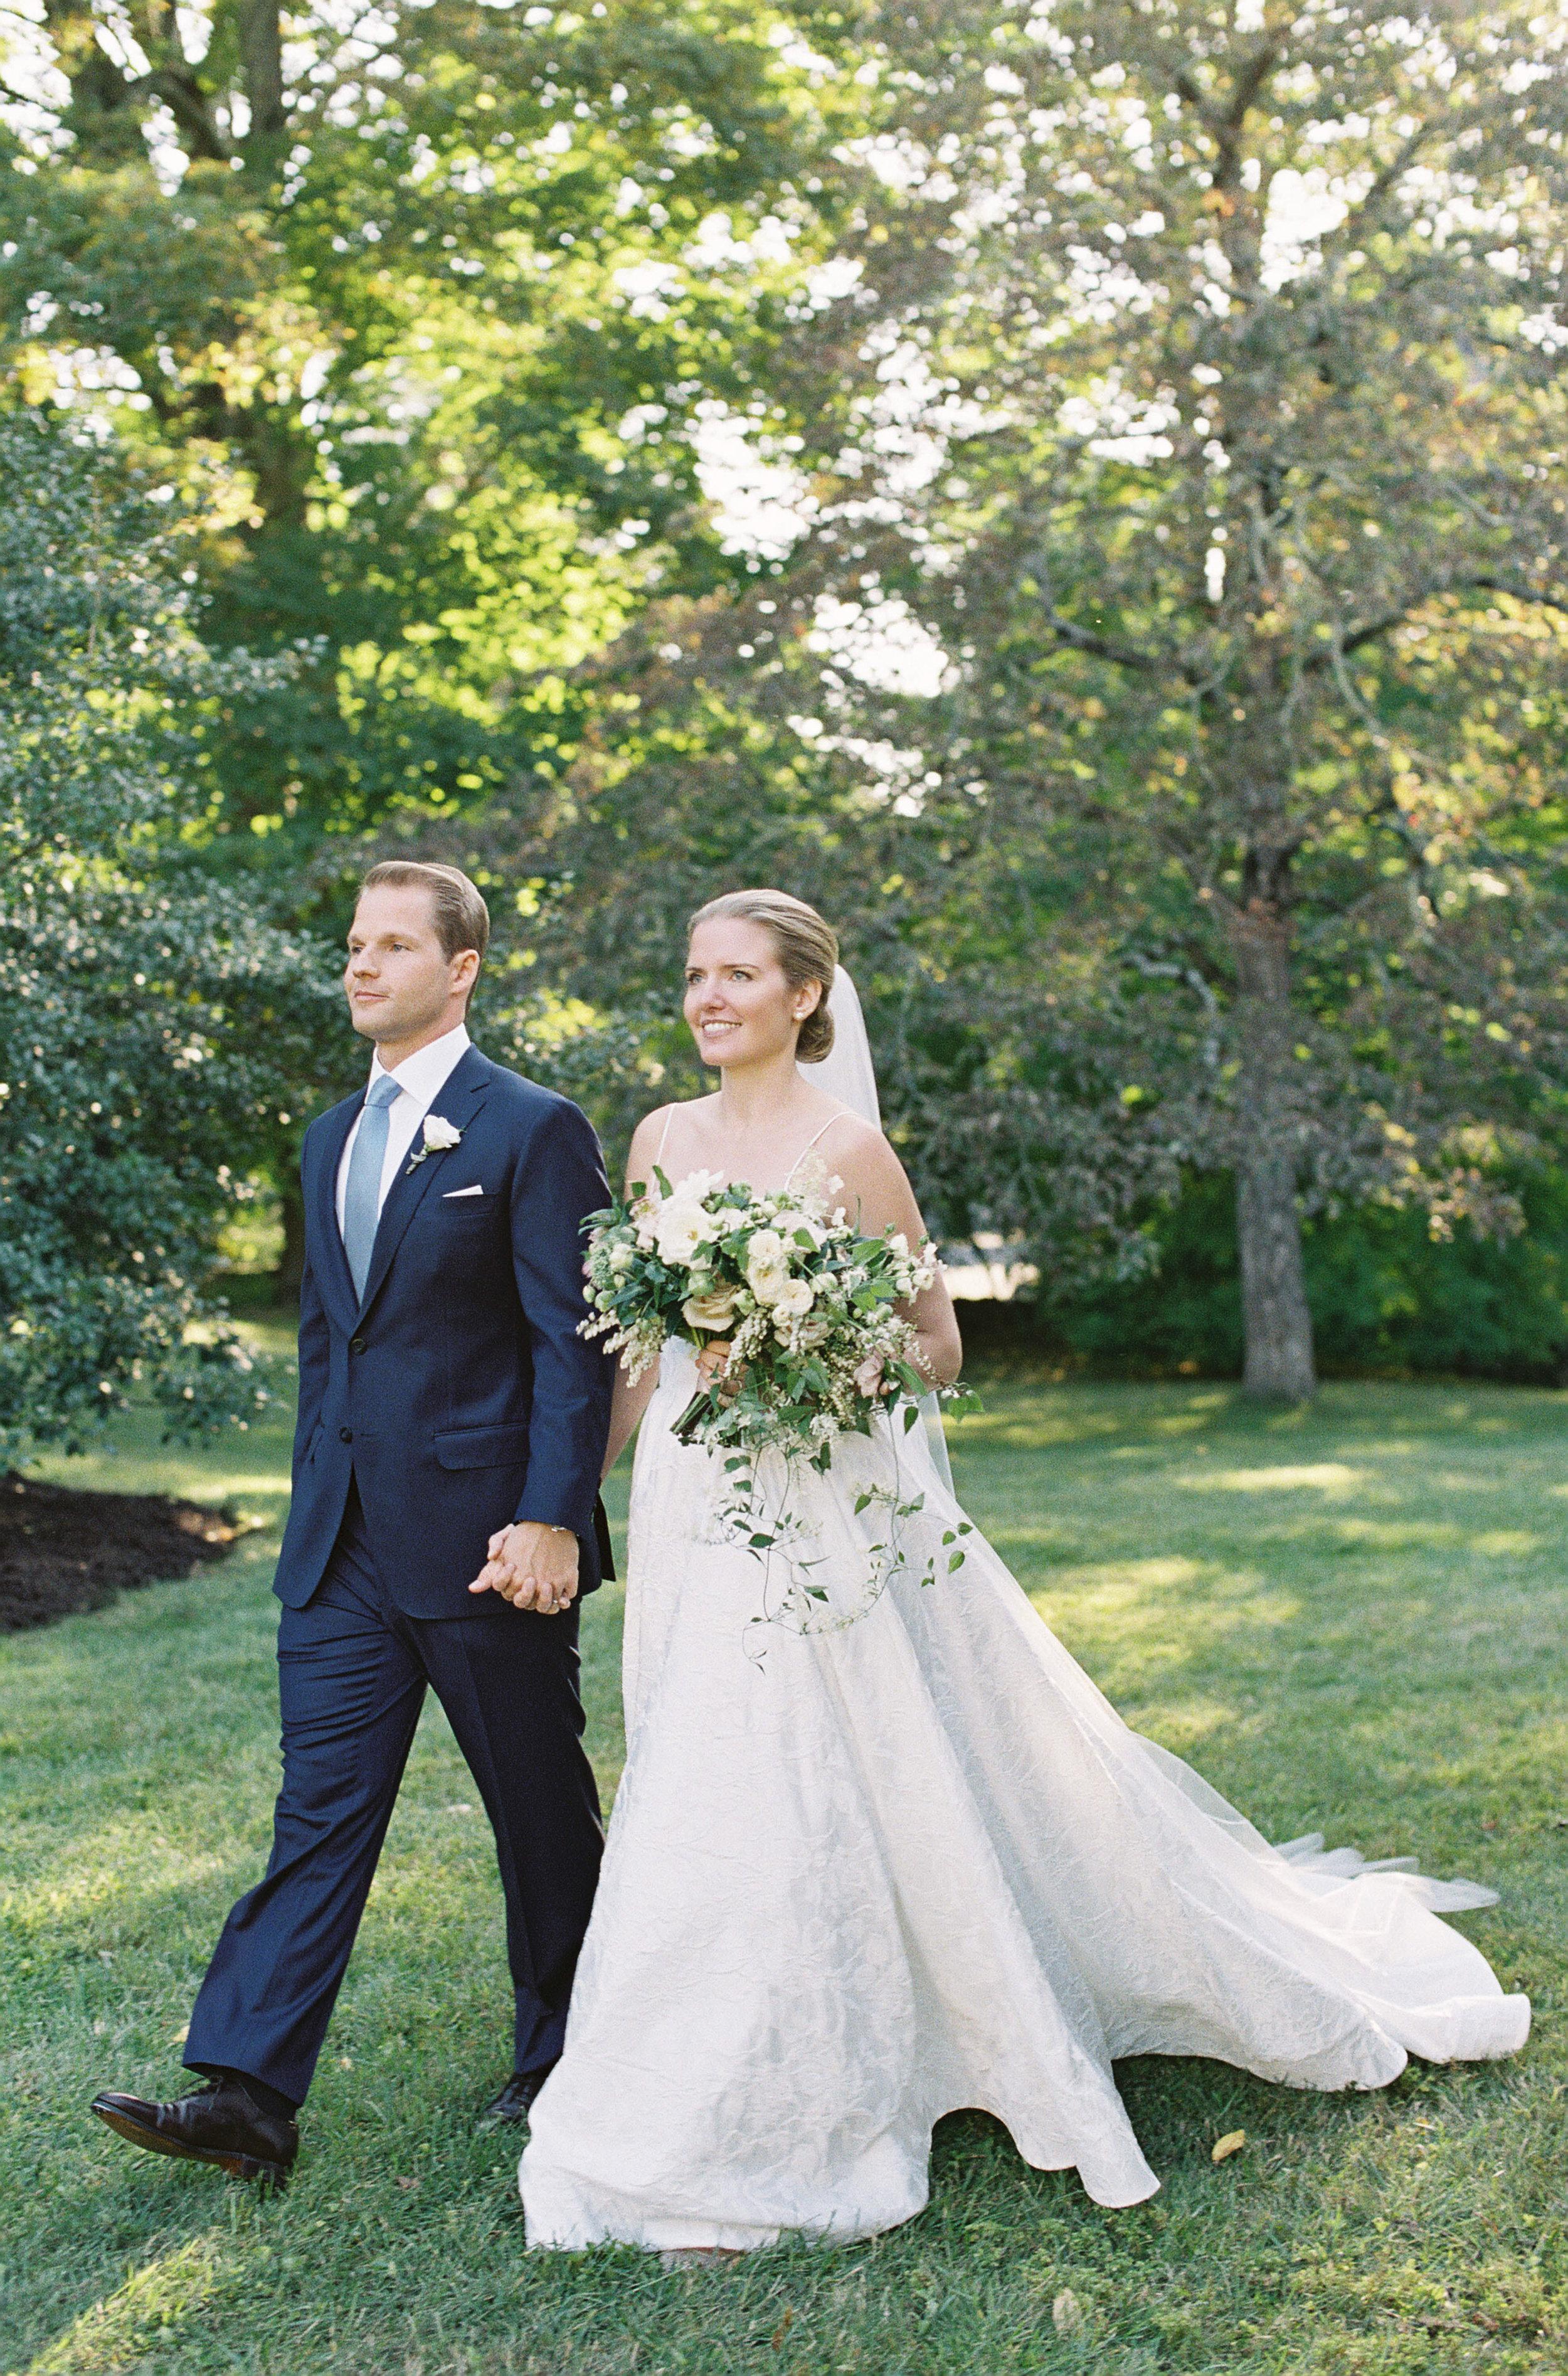 Connecticut-Wedding-43-Jen-Huang-20170909-KB-45-Jen_Huang-006793-R1-010_Retouching_v01.jpg